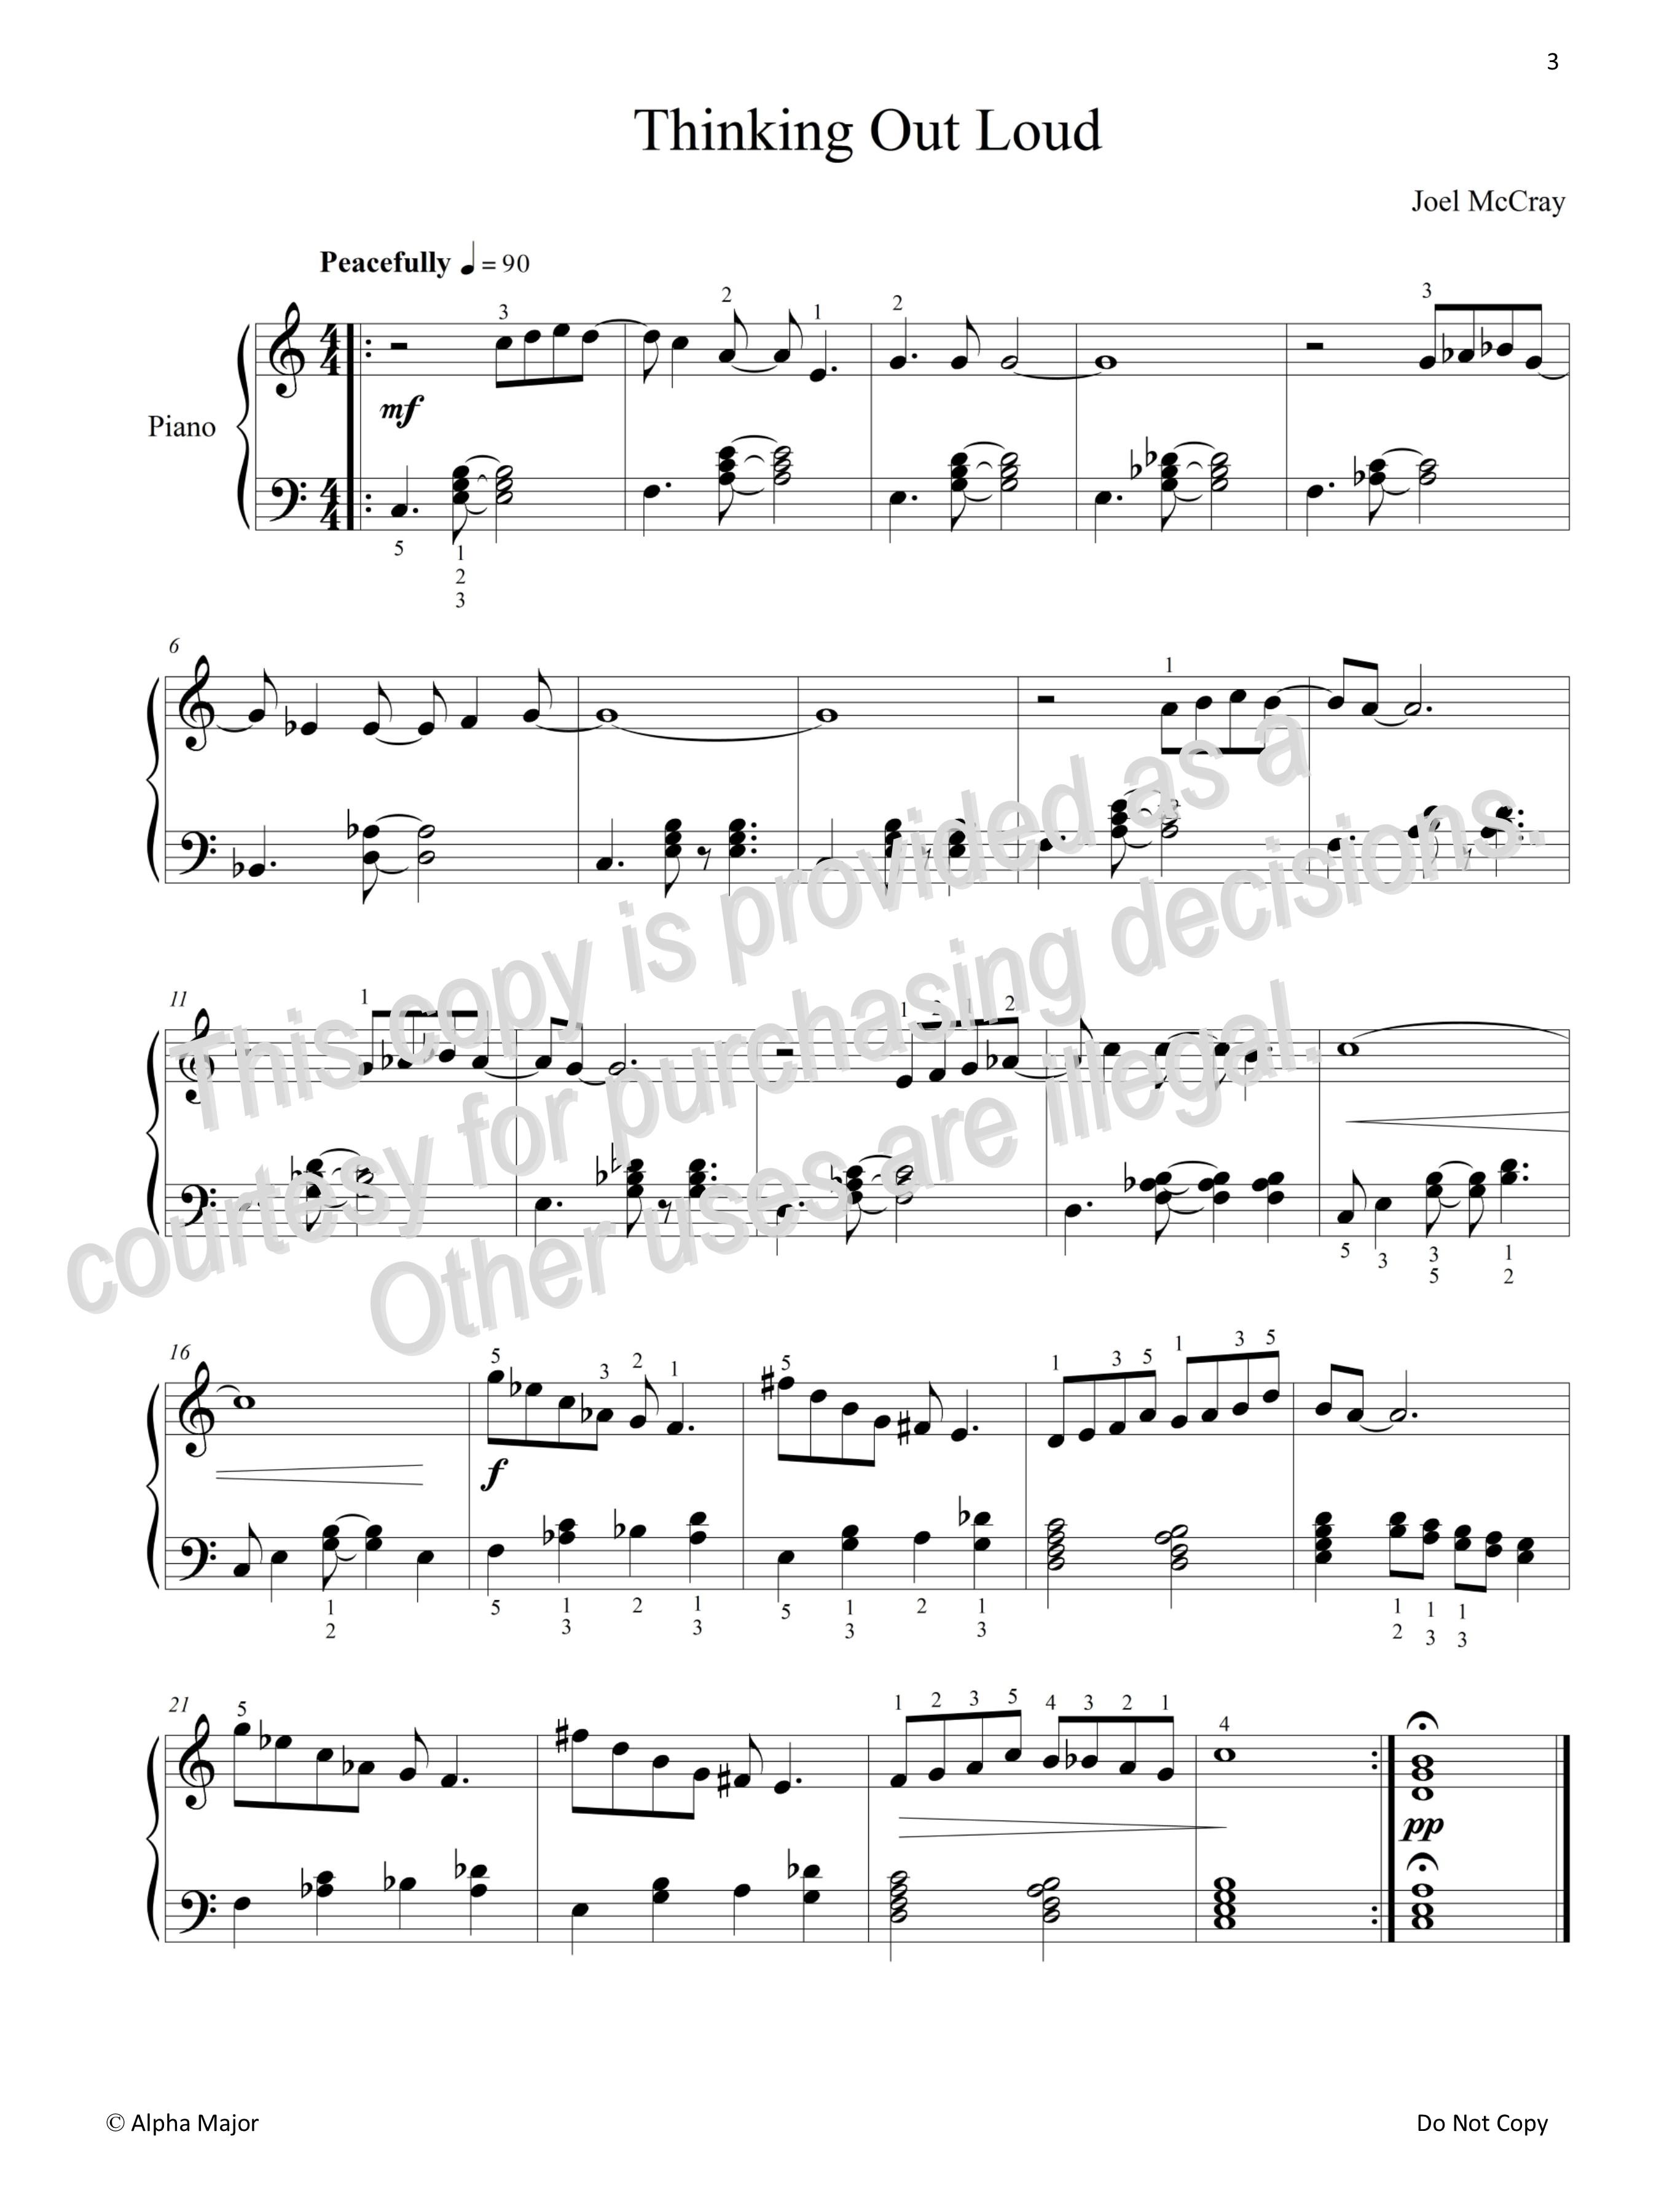 Smart Jazz - By Joel McCray: Piano Solo Intermediate Sheet Music Collection